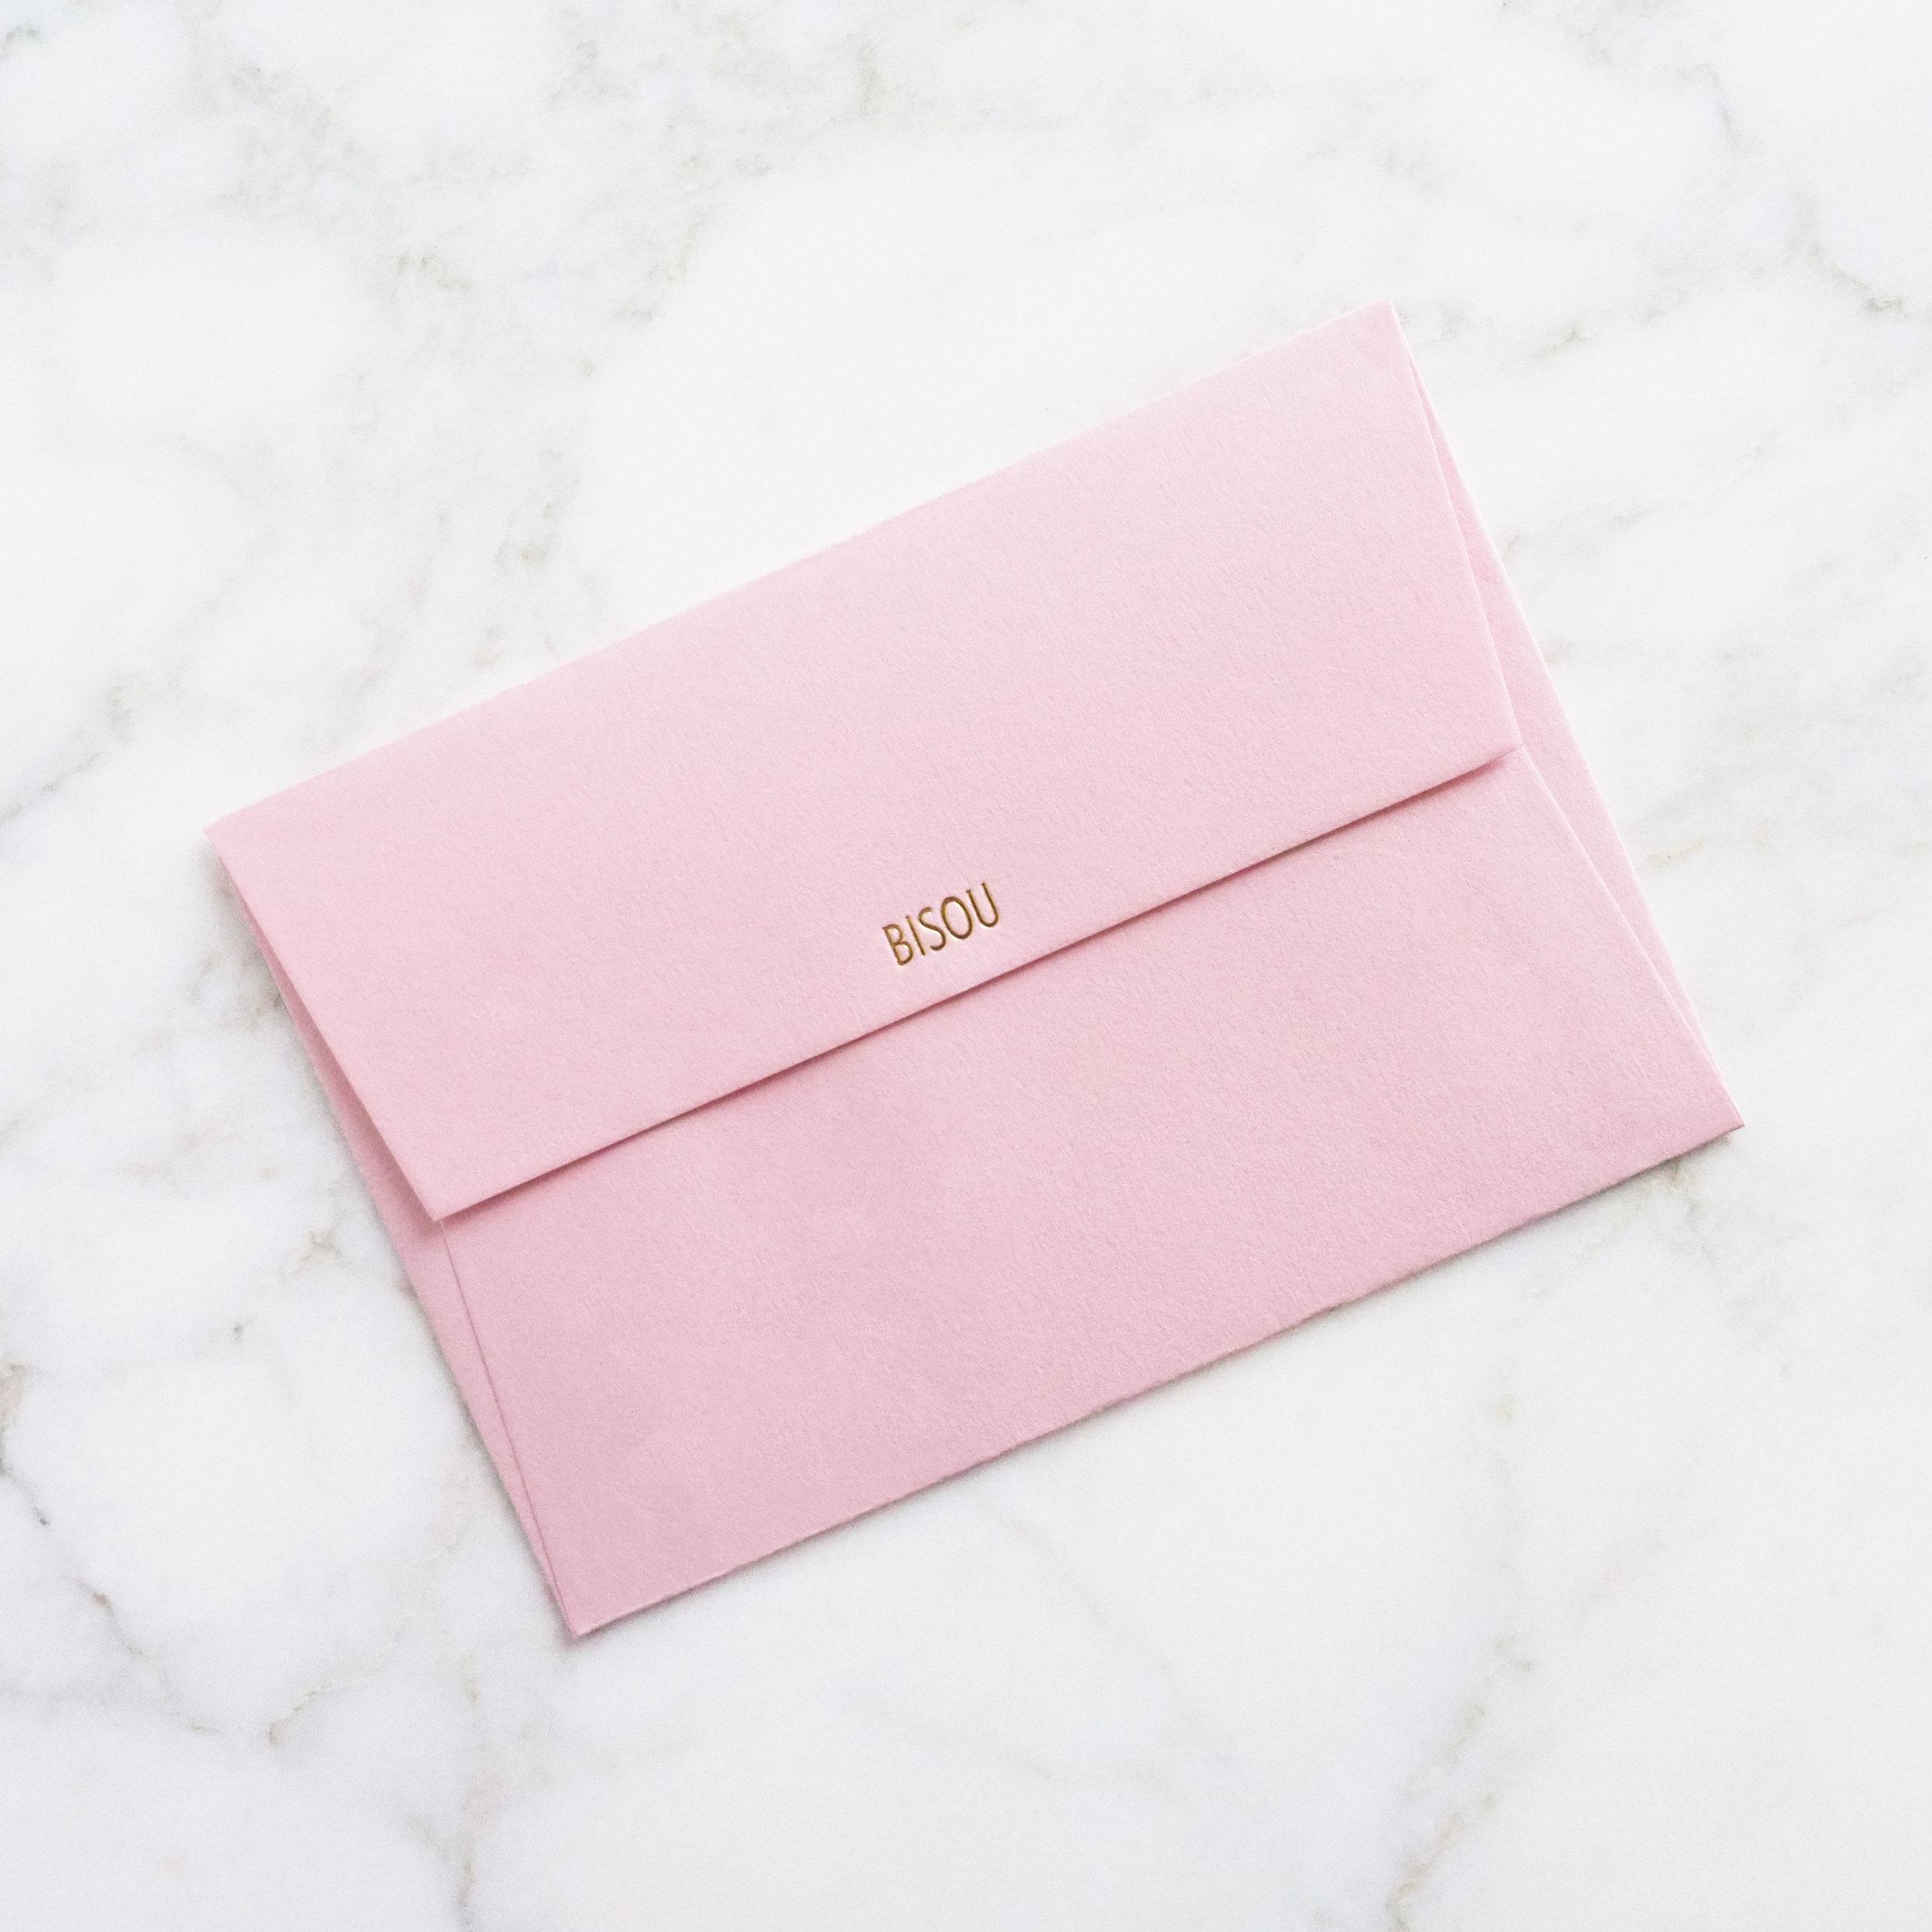 candy-pink-foil-envelope-diagonal.jpg